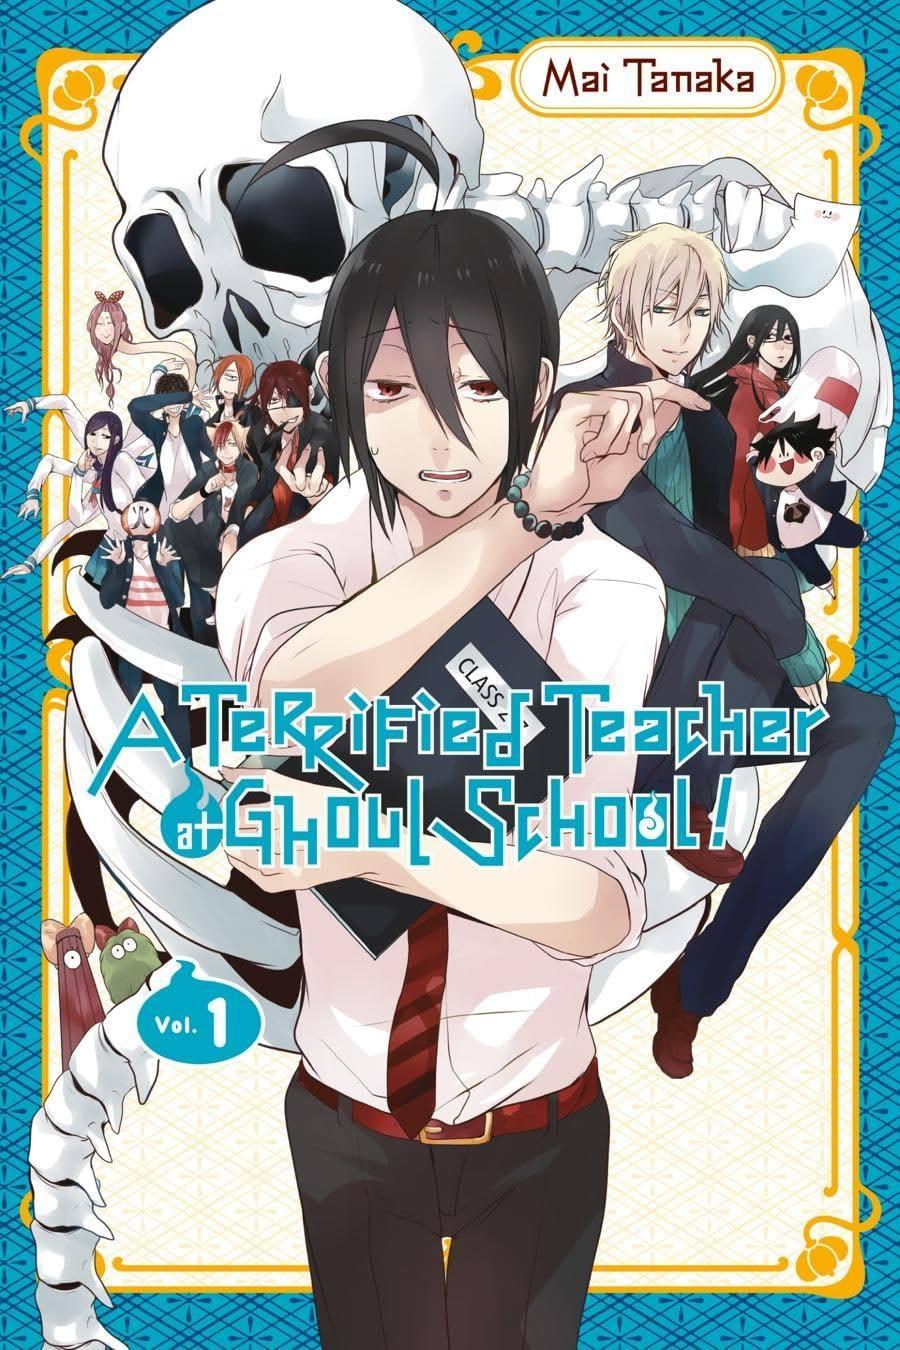 A Terrified Teacher at Ghoul School! Vol. 1